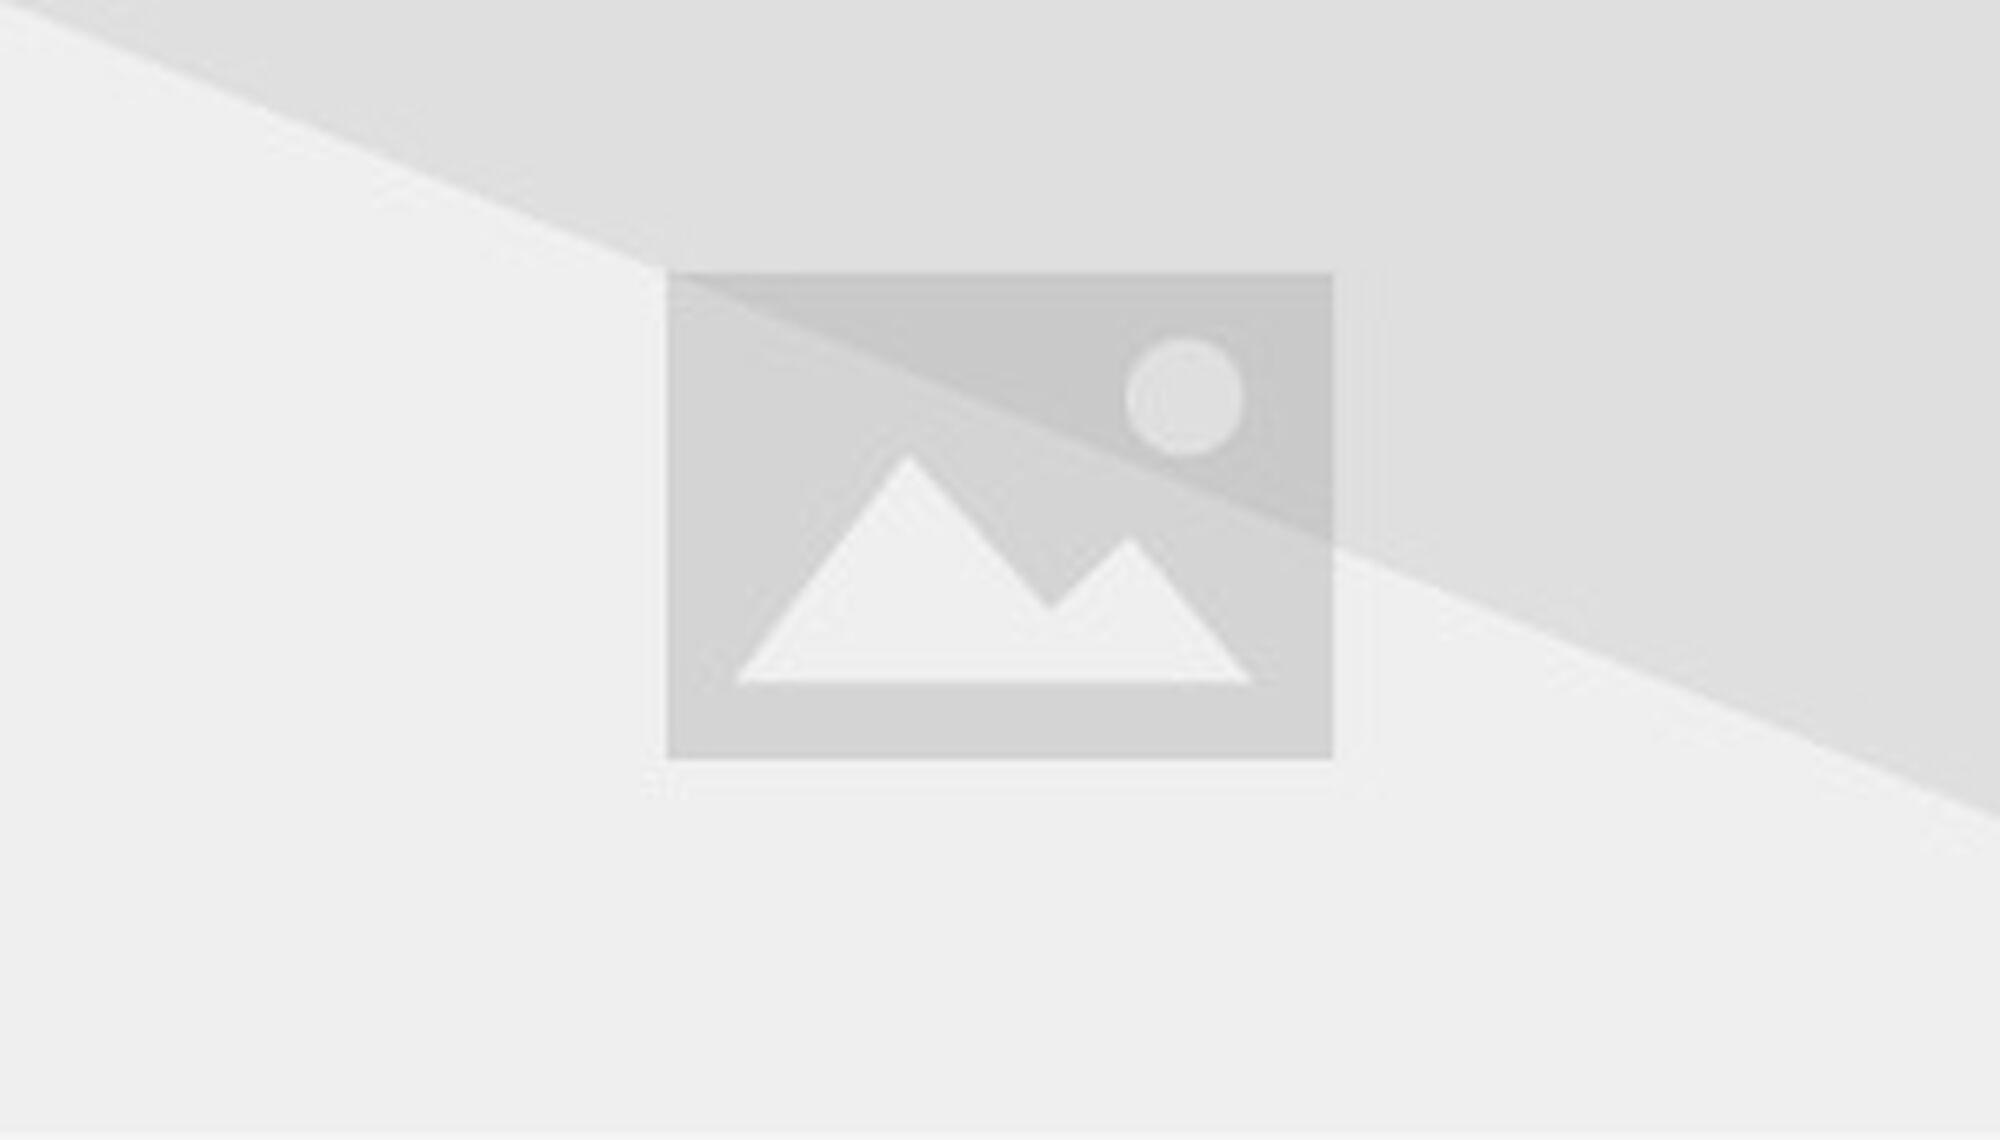 Protagonist Persona 3 Portable Female Protagonist Persona 3